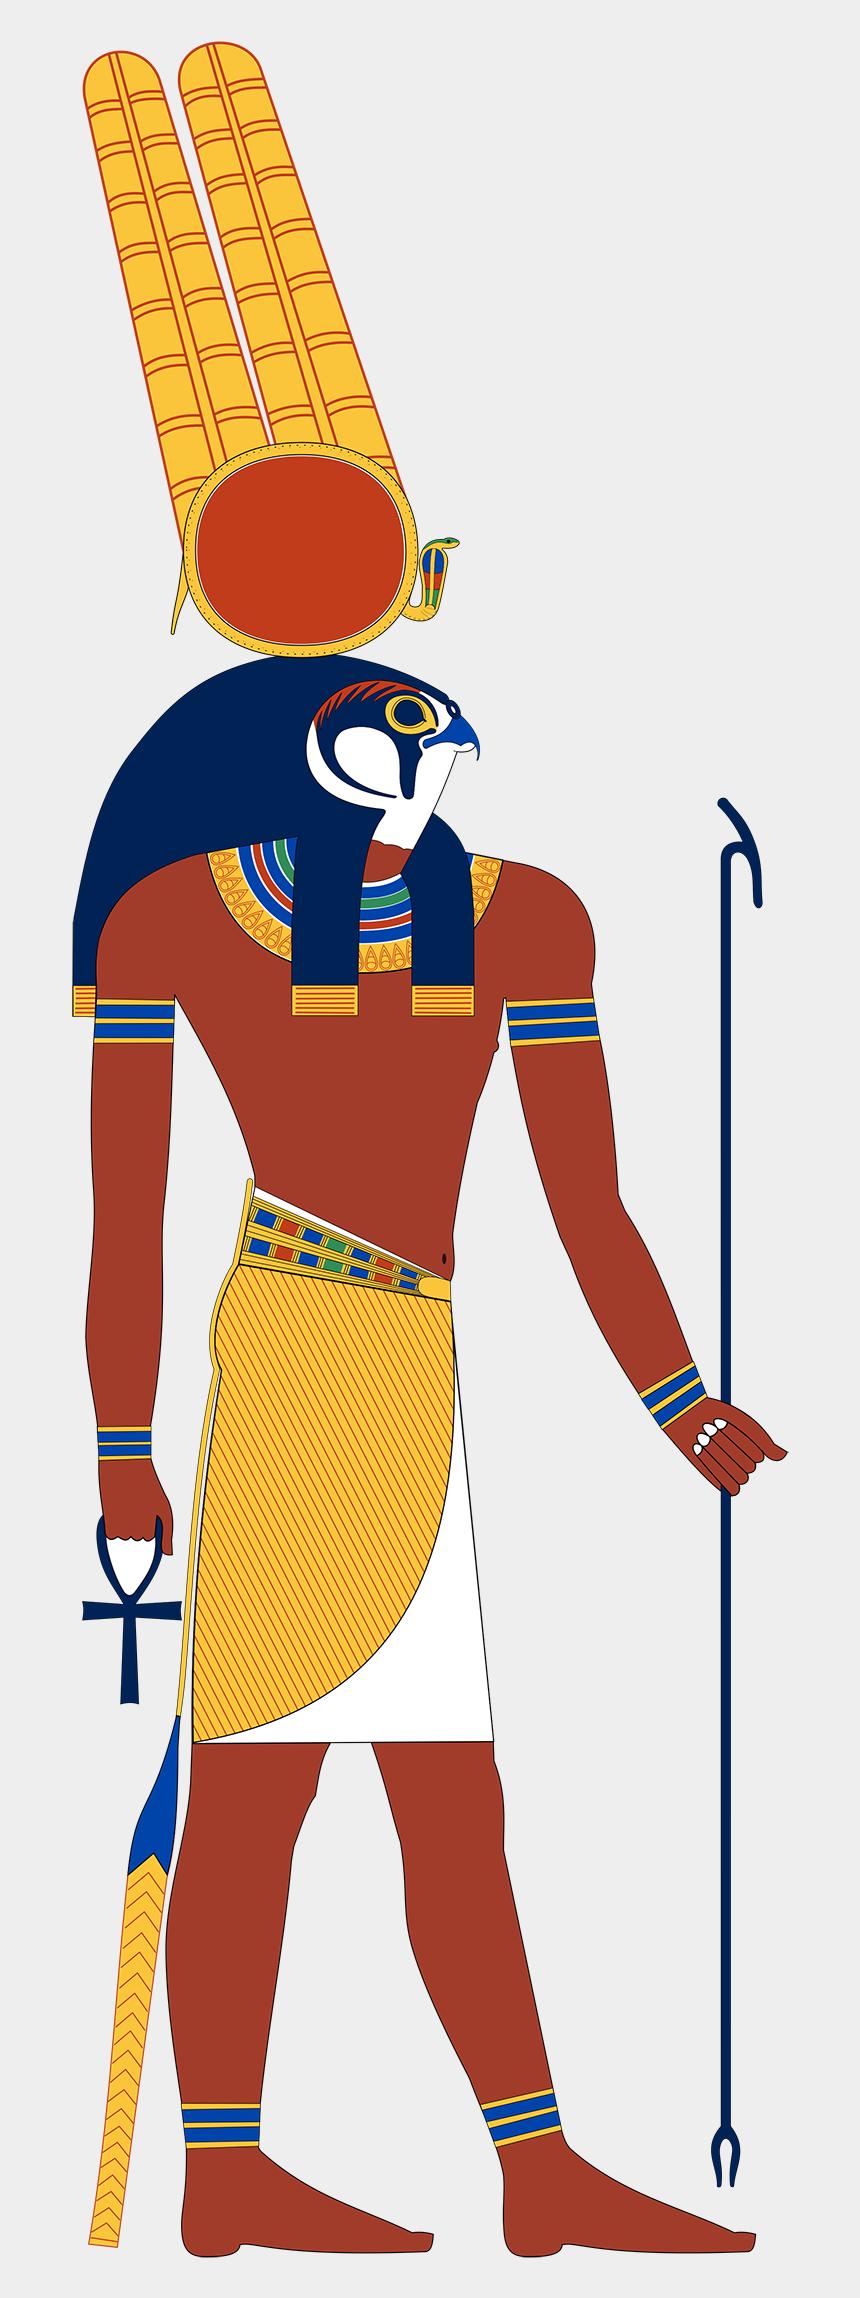 greek god atlas clipart, Cartoons - Egyptian War God Montu - Egyptian God Khnum